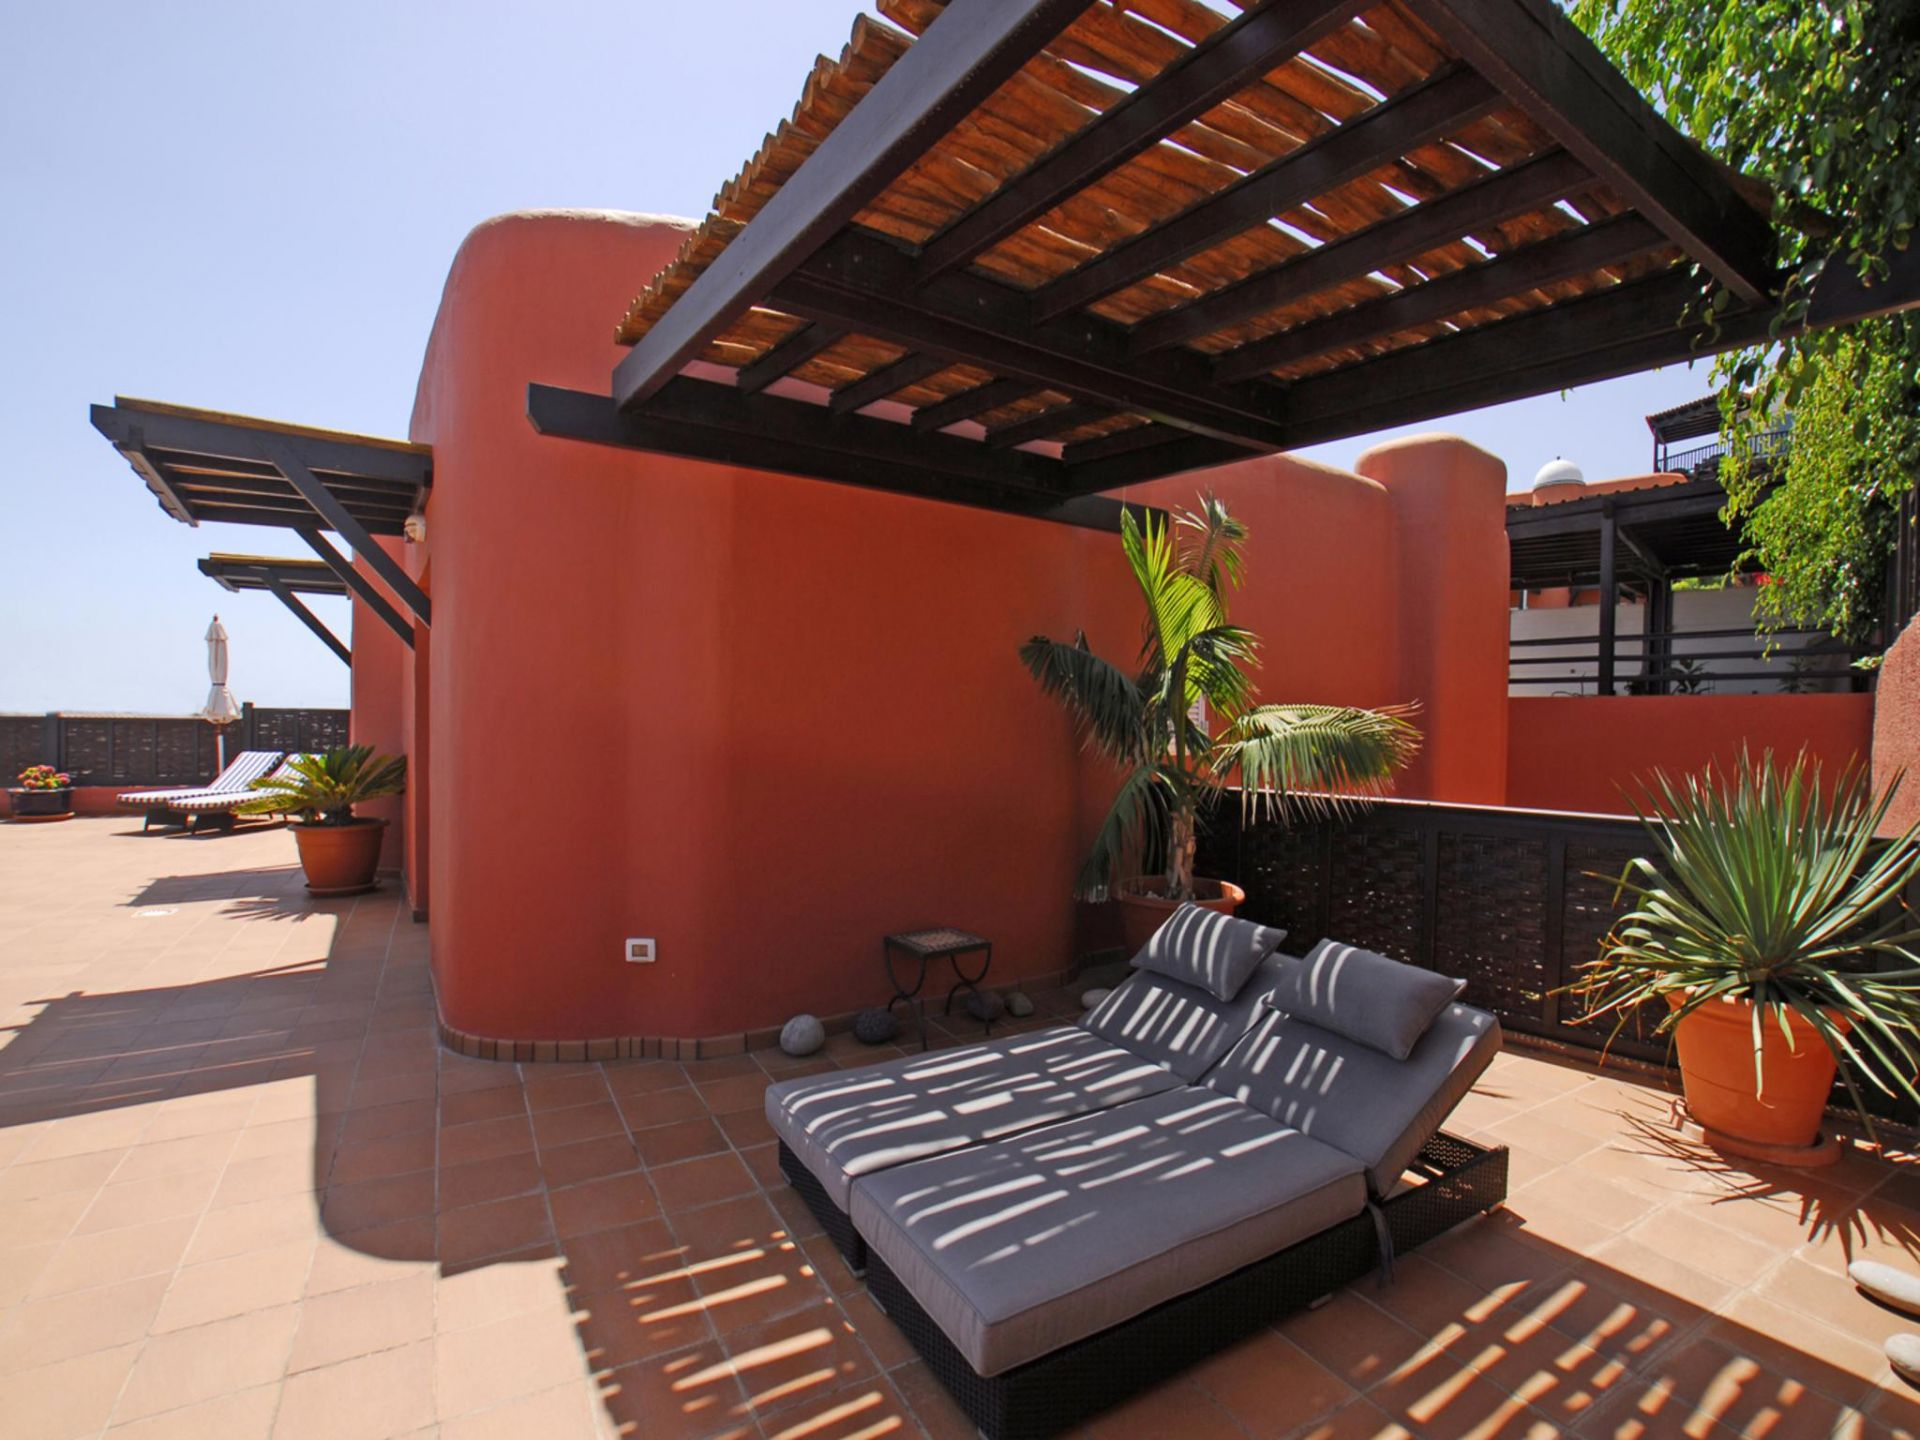 Holiday apartment Villa San Agustin 10 - Holiday Rental (854295), Maspalomas, Gran Canaria, Canary Islands, Spain, picture 8